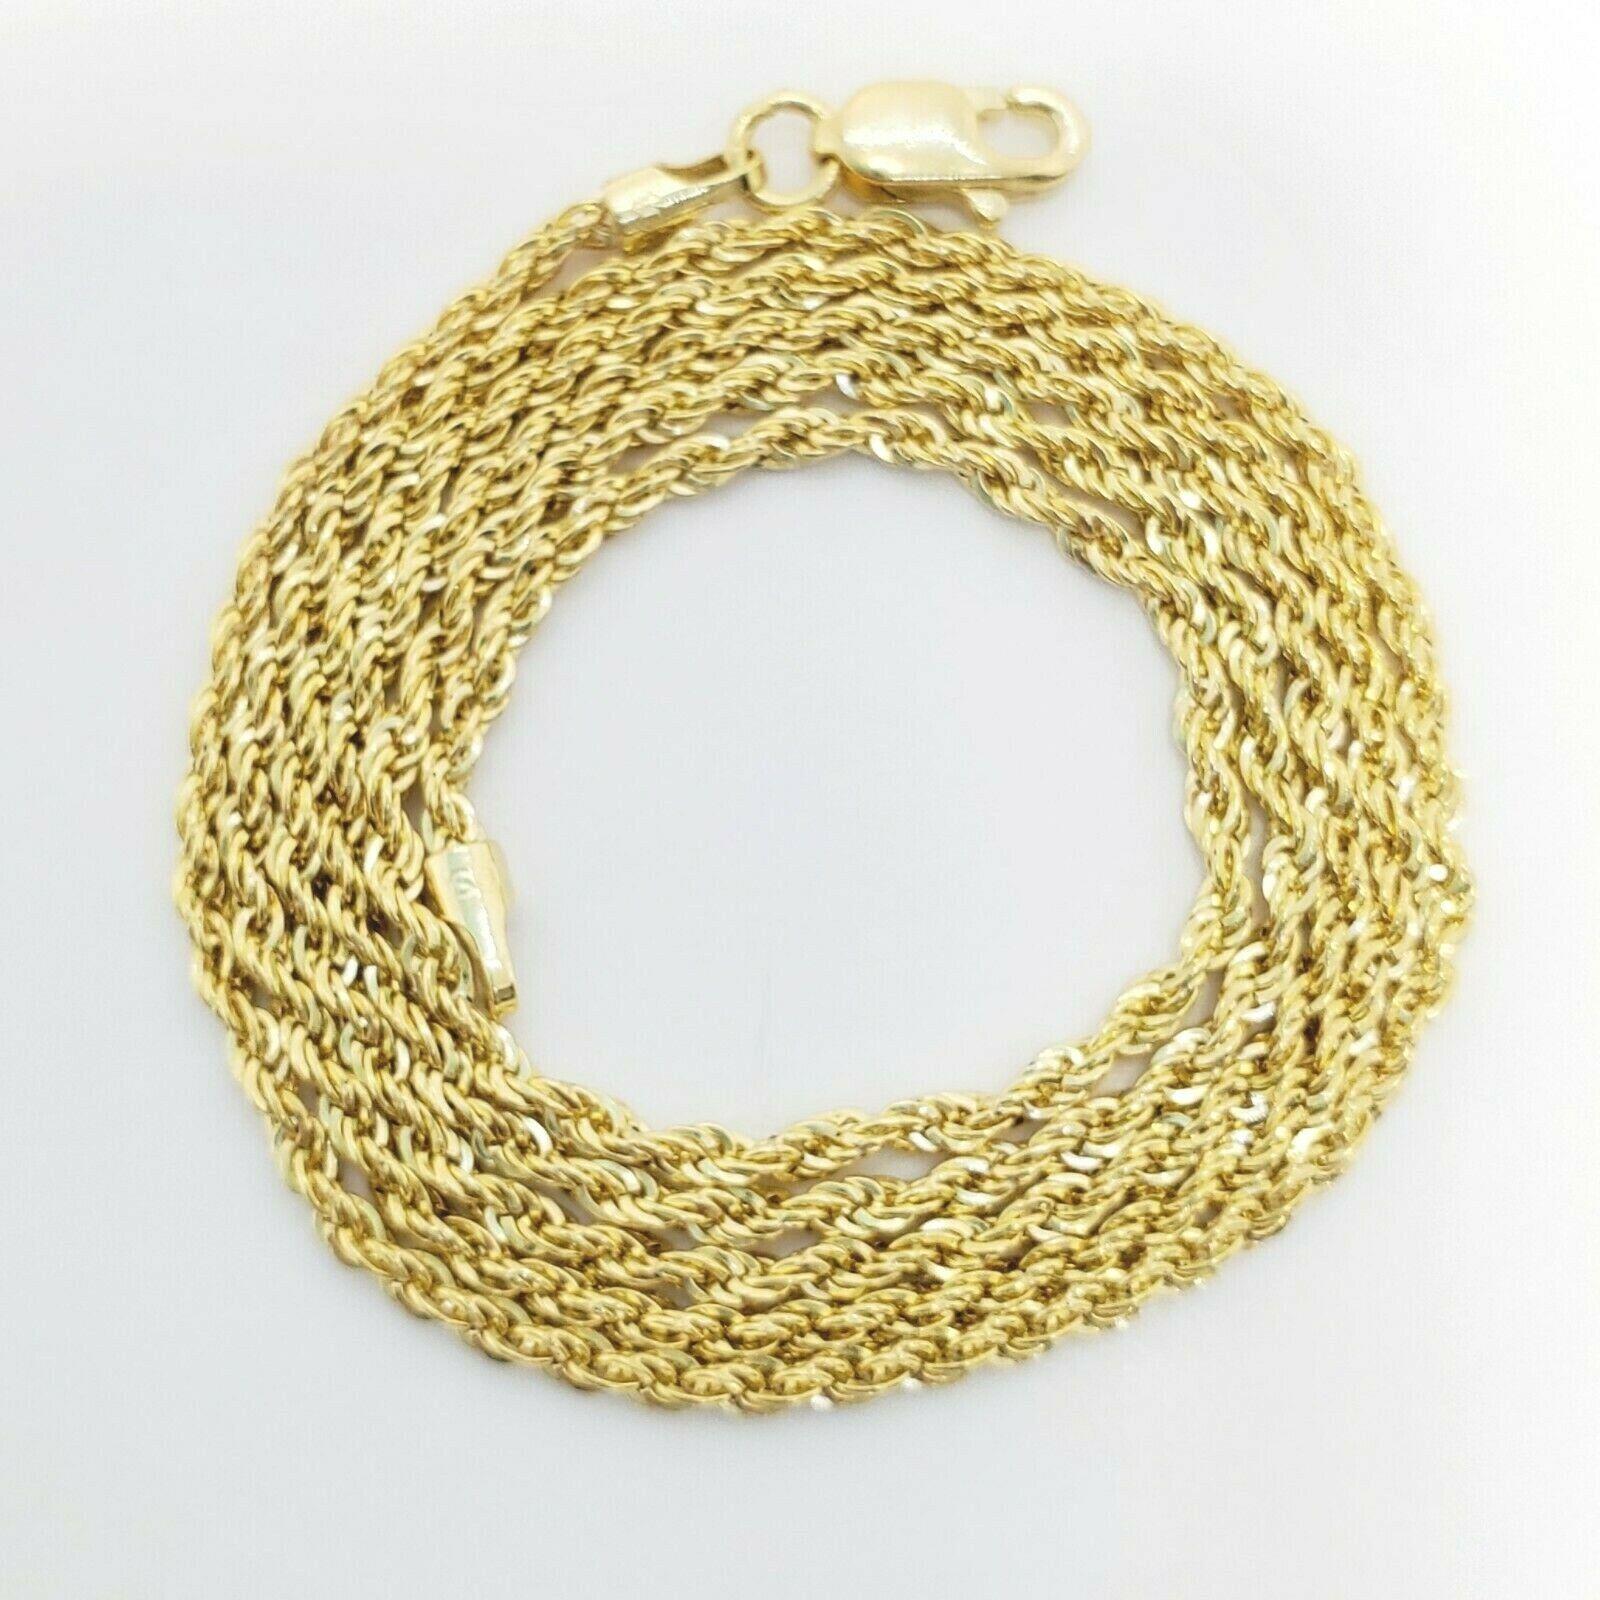 "10K Yellow Gold 1.5mm Diamond Cut Rope Chain Pendant Necklace Mens Women 16""-26"" 2"